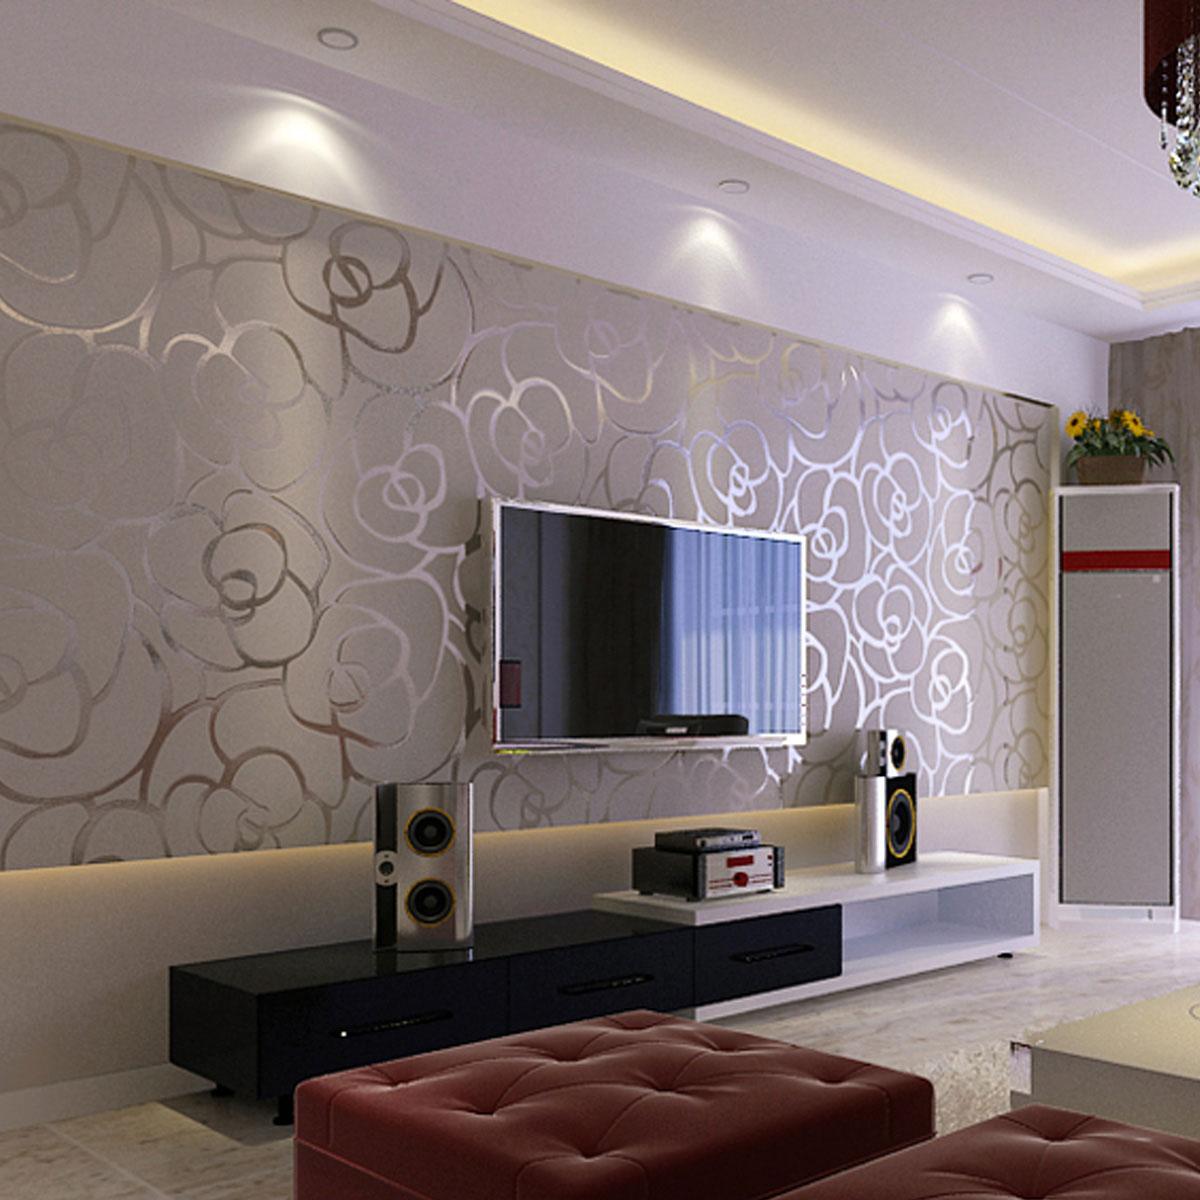 wallpaper interior design ideas photo - 6